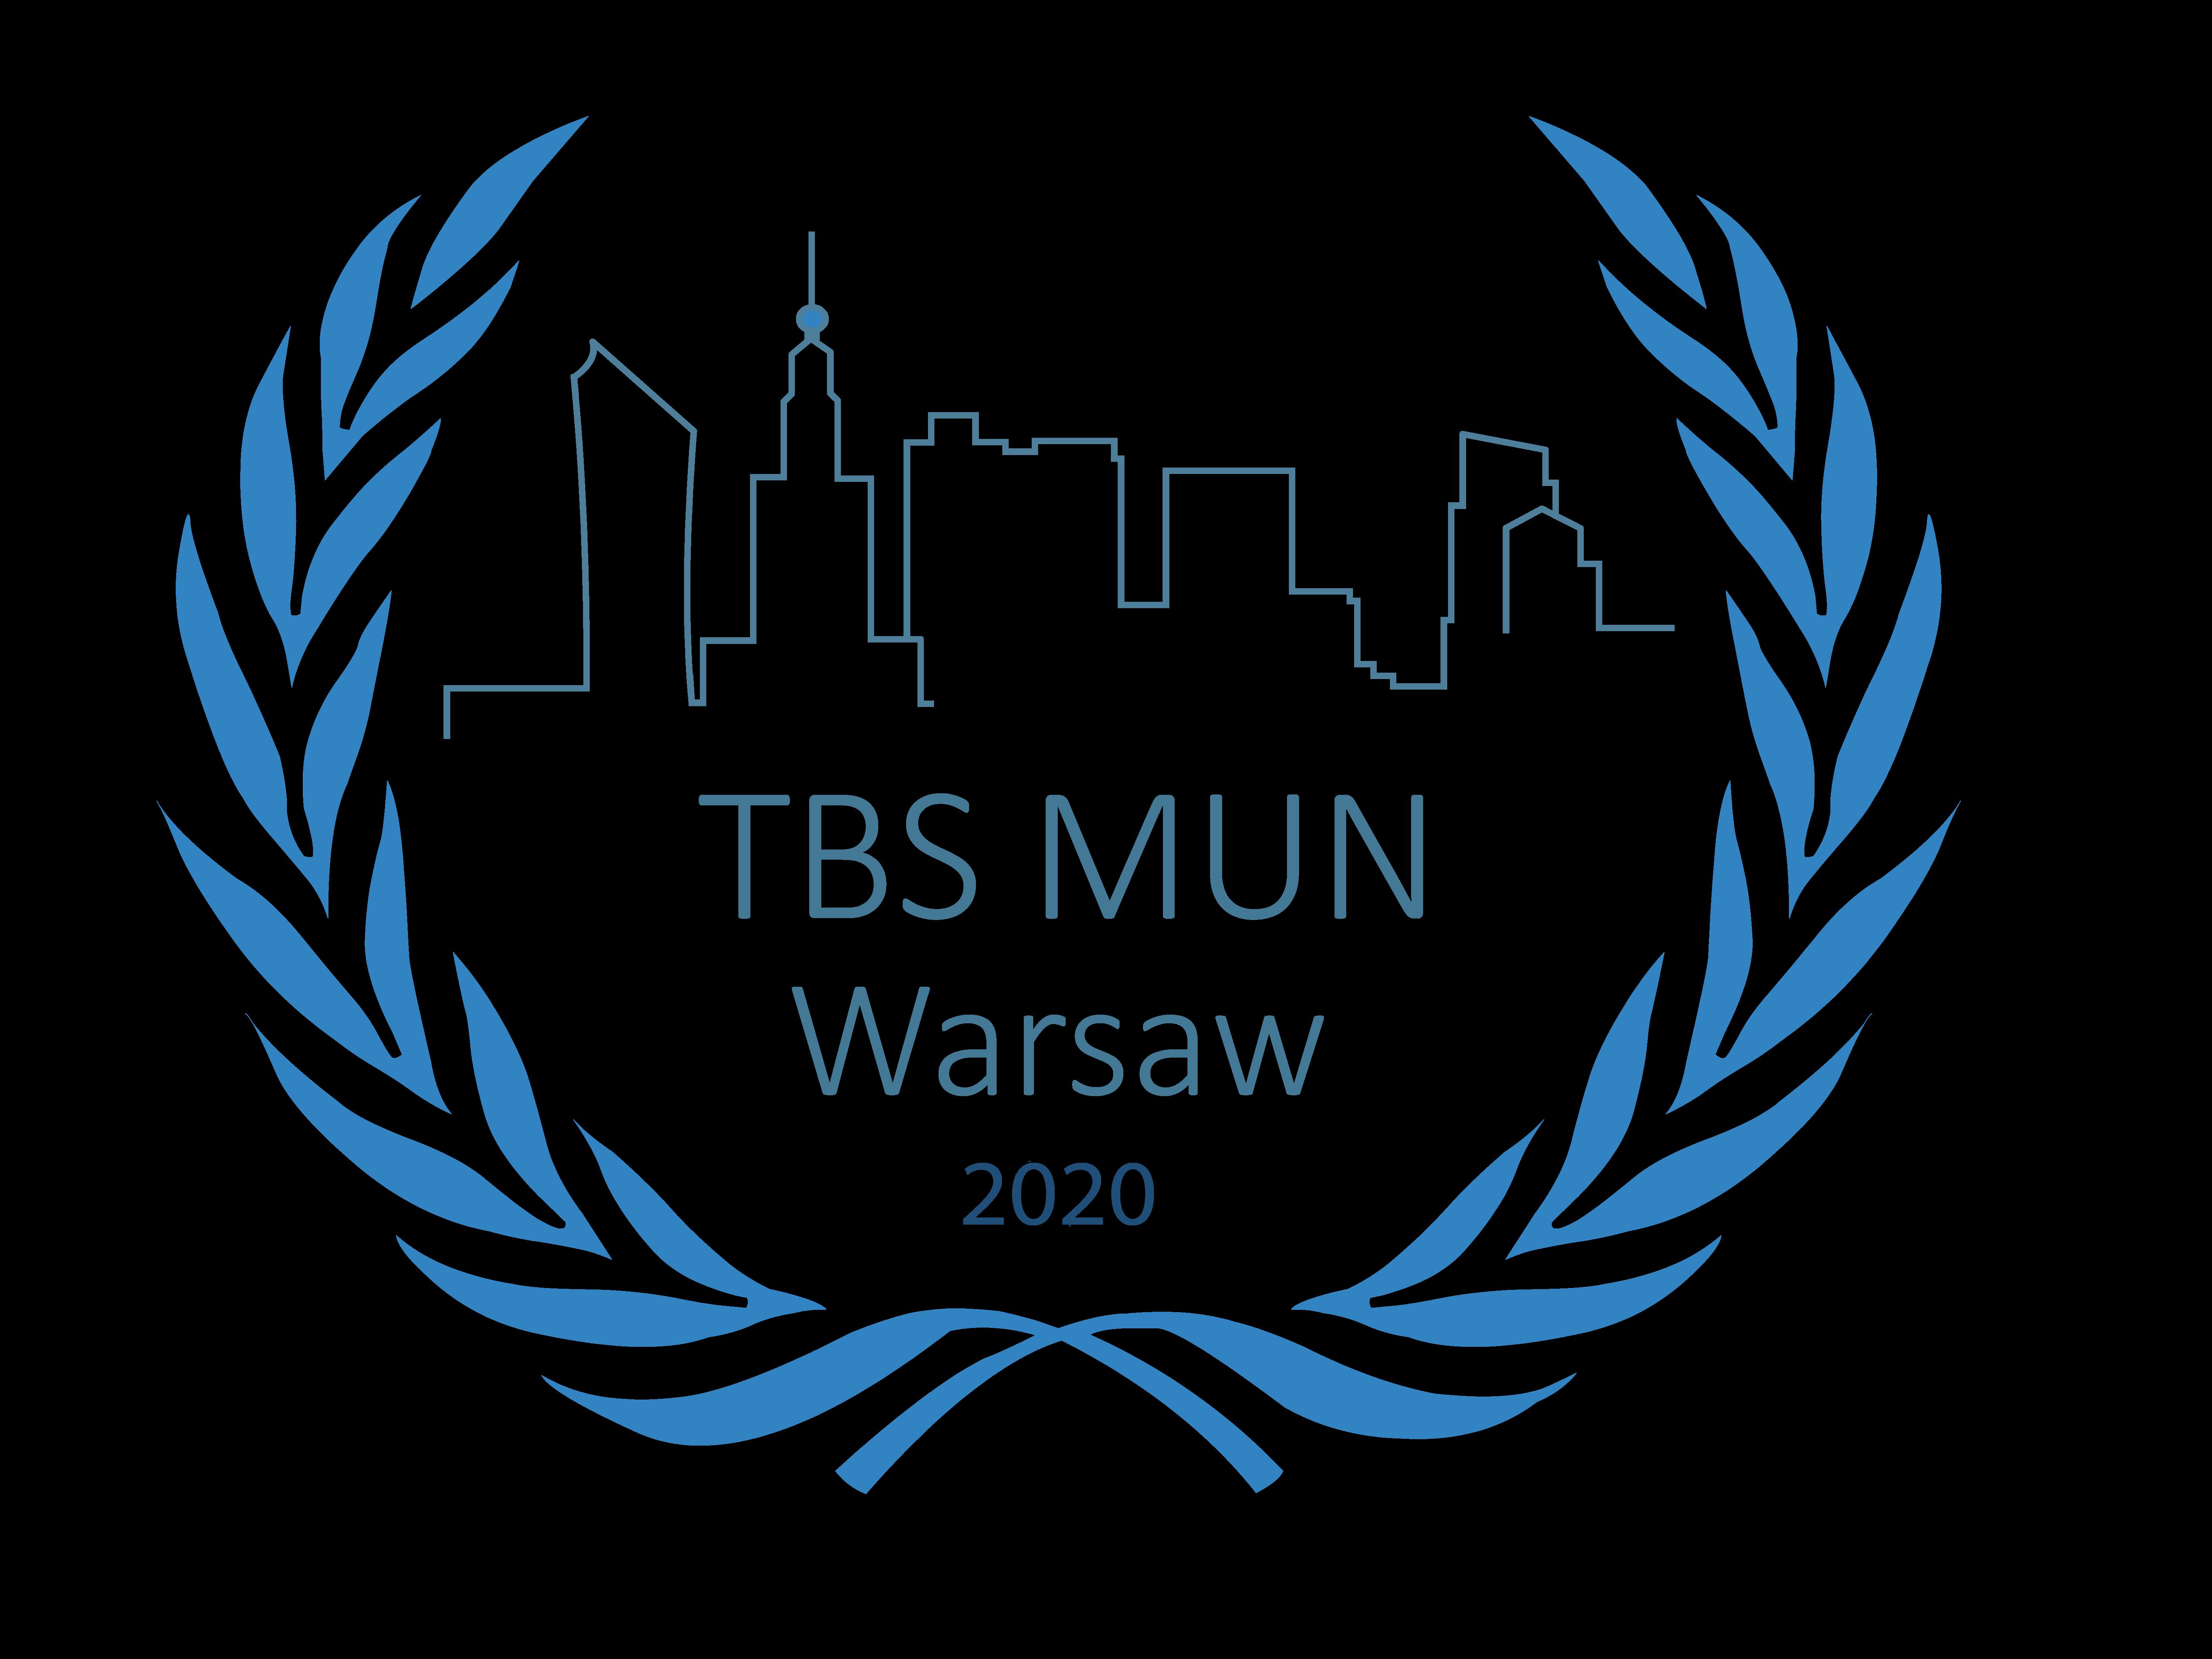 TBSMUN 2020